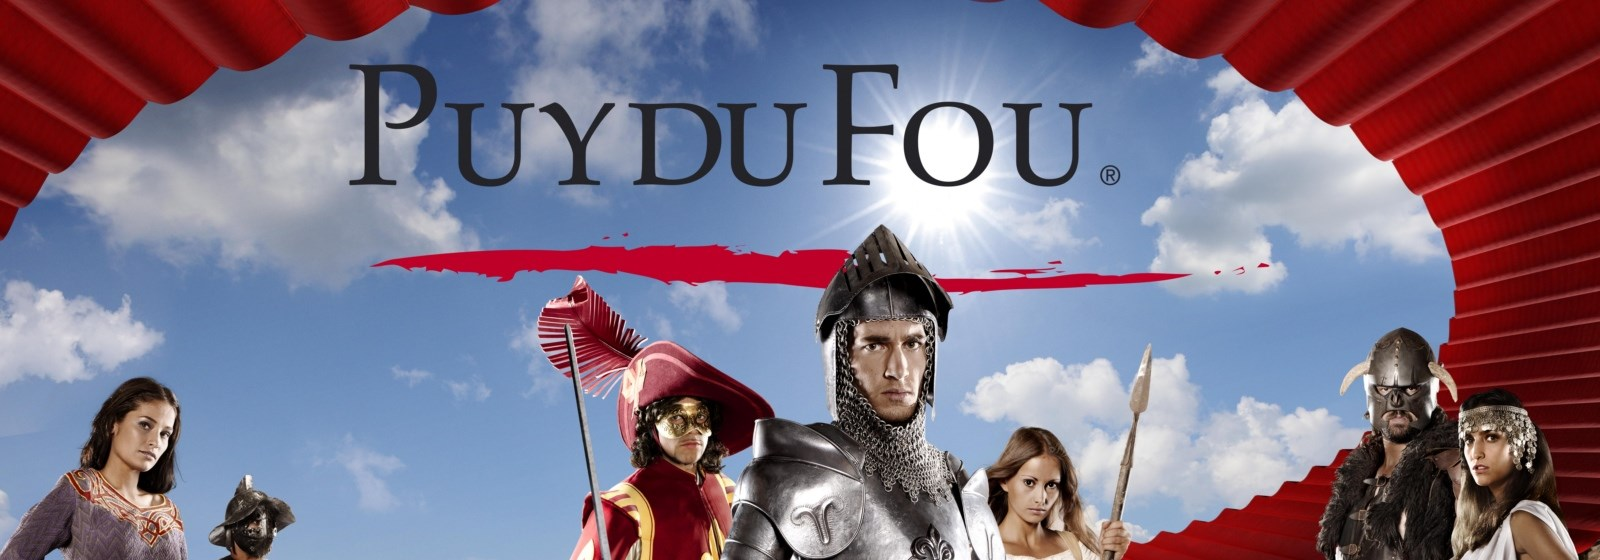 Puydufou